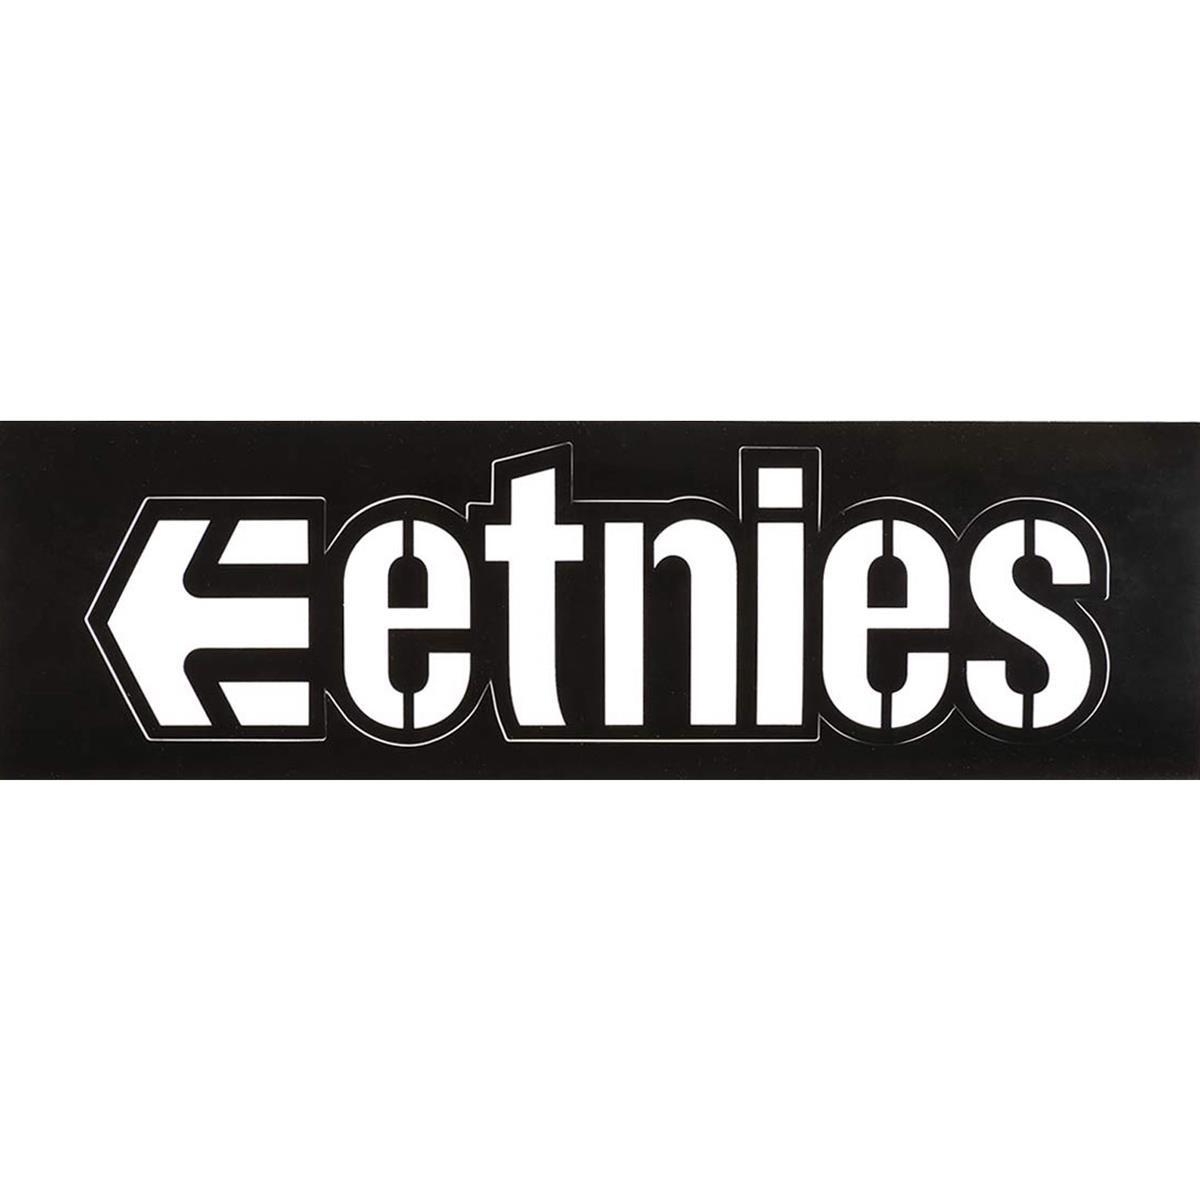 etnies sticker logo white schwarz maciag offroad